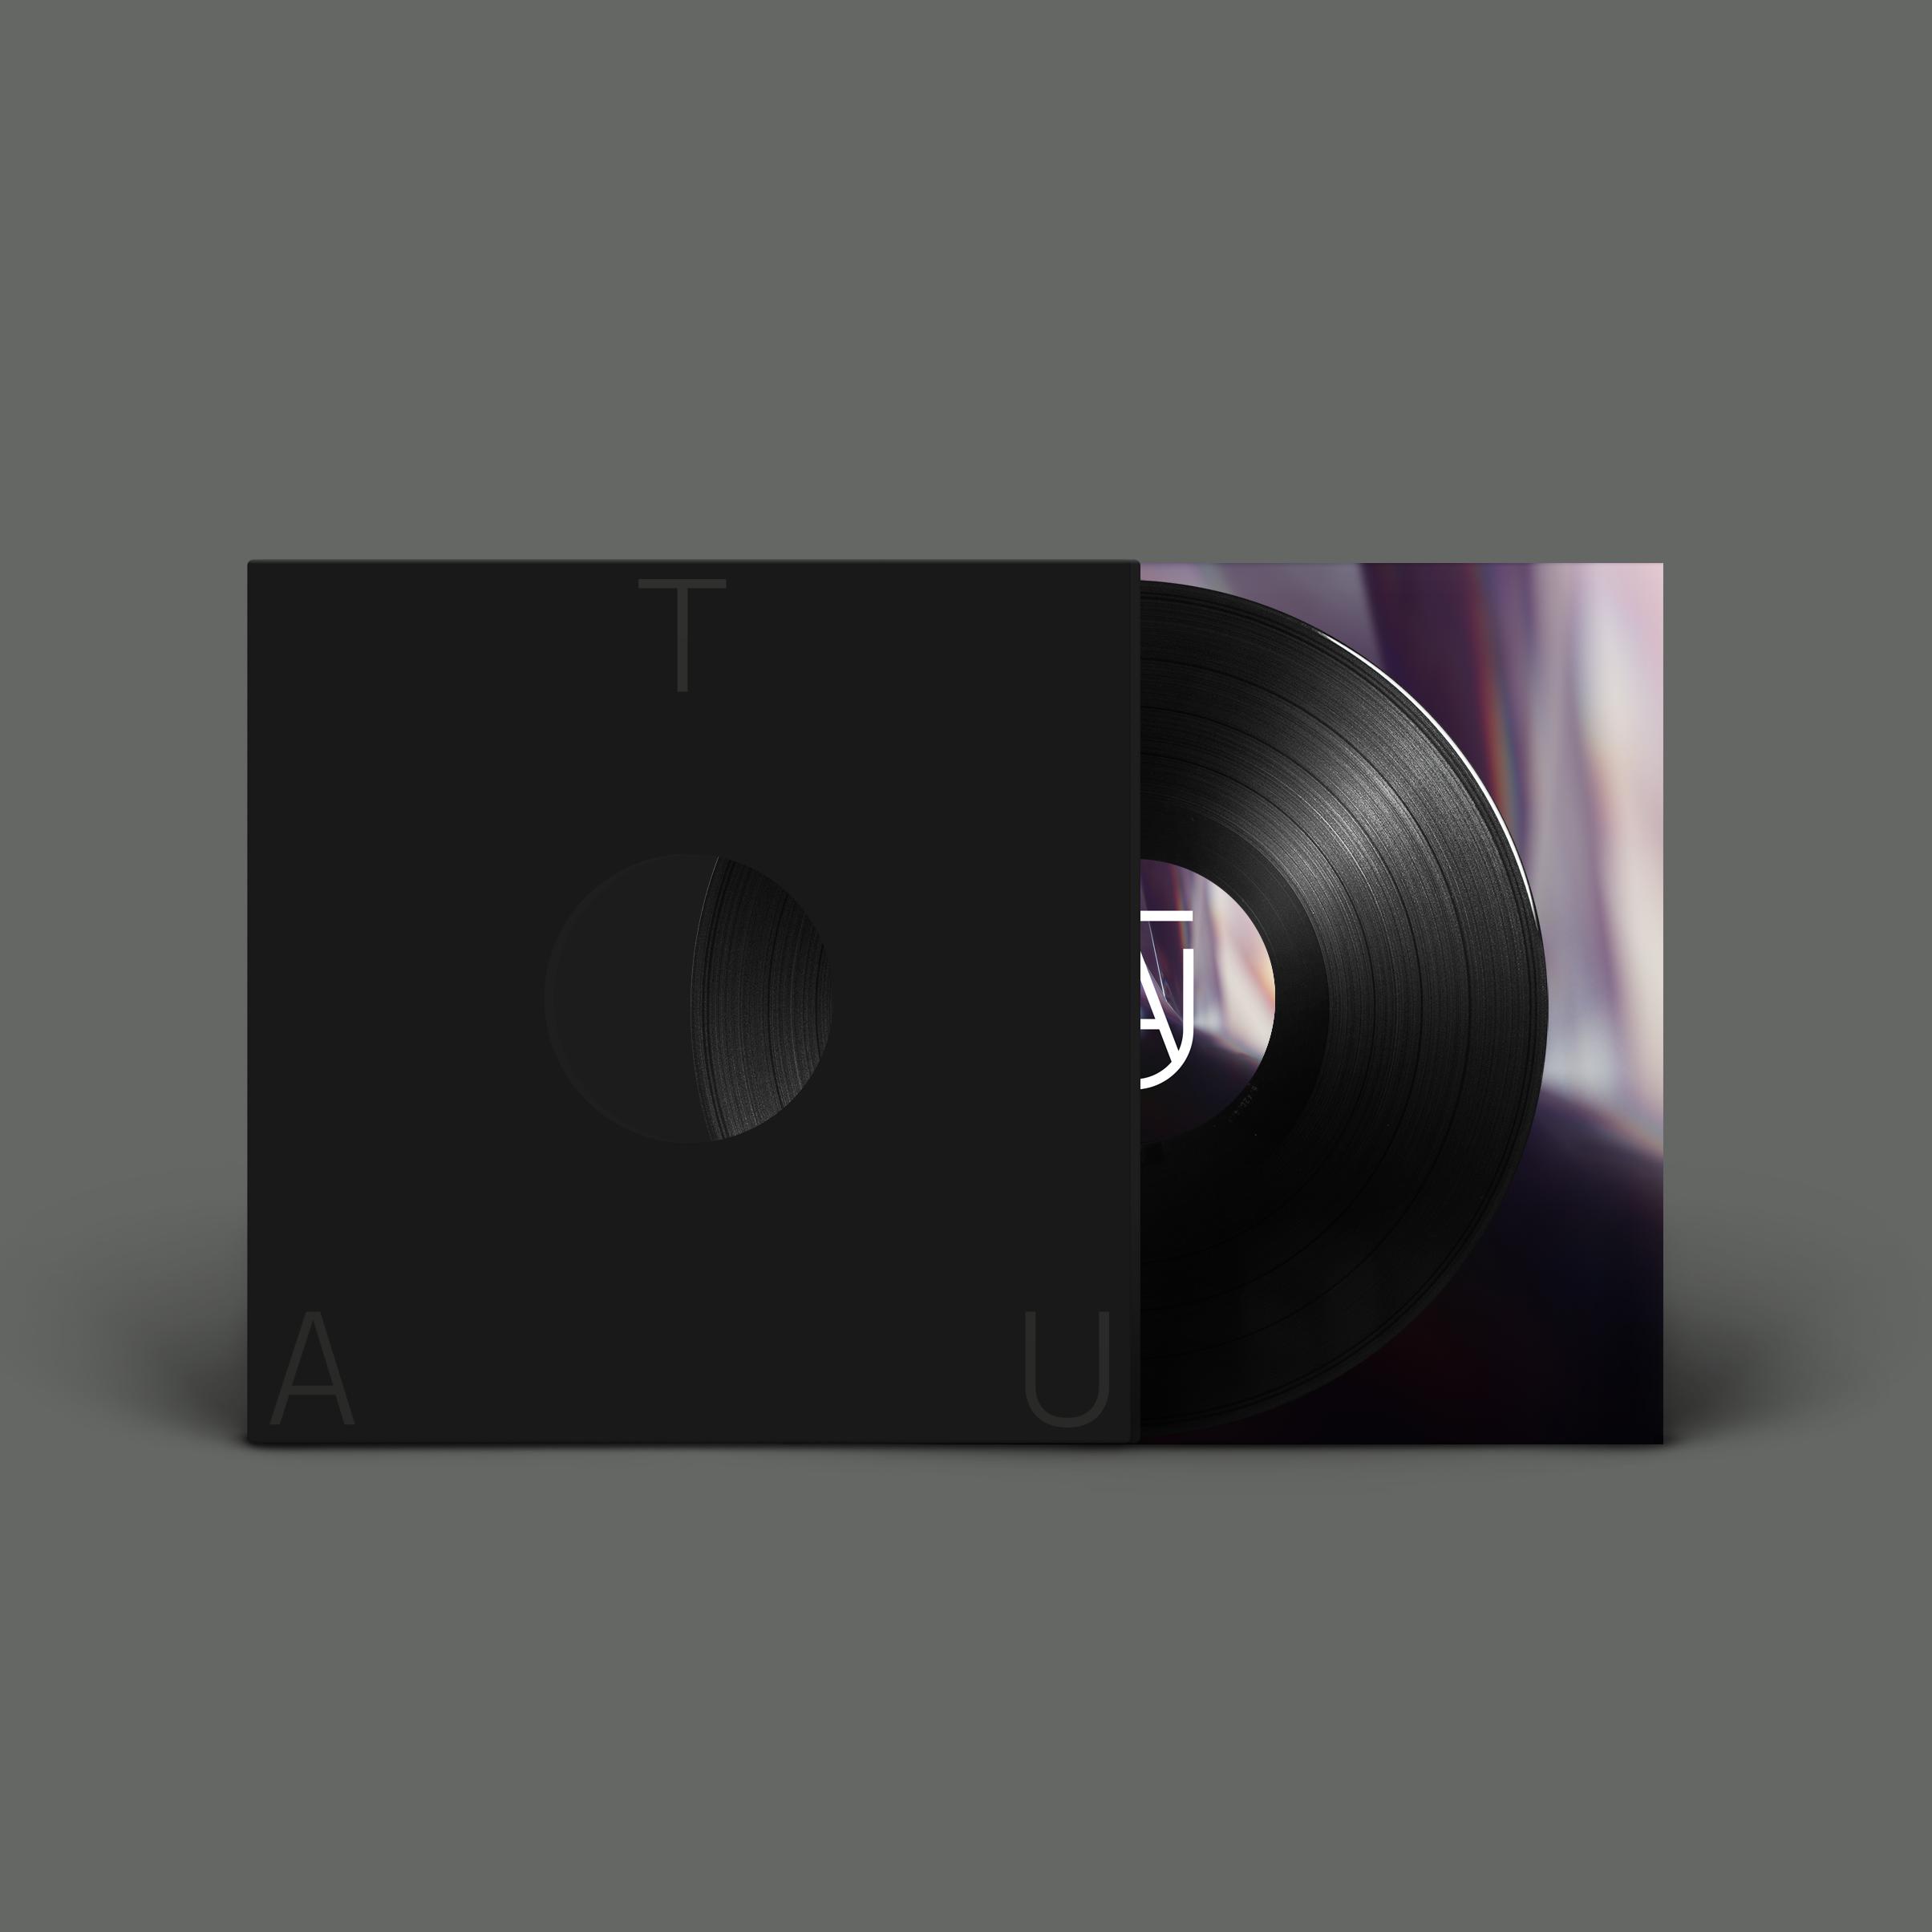 TAU003 Vinyl